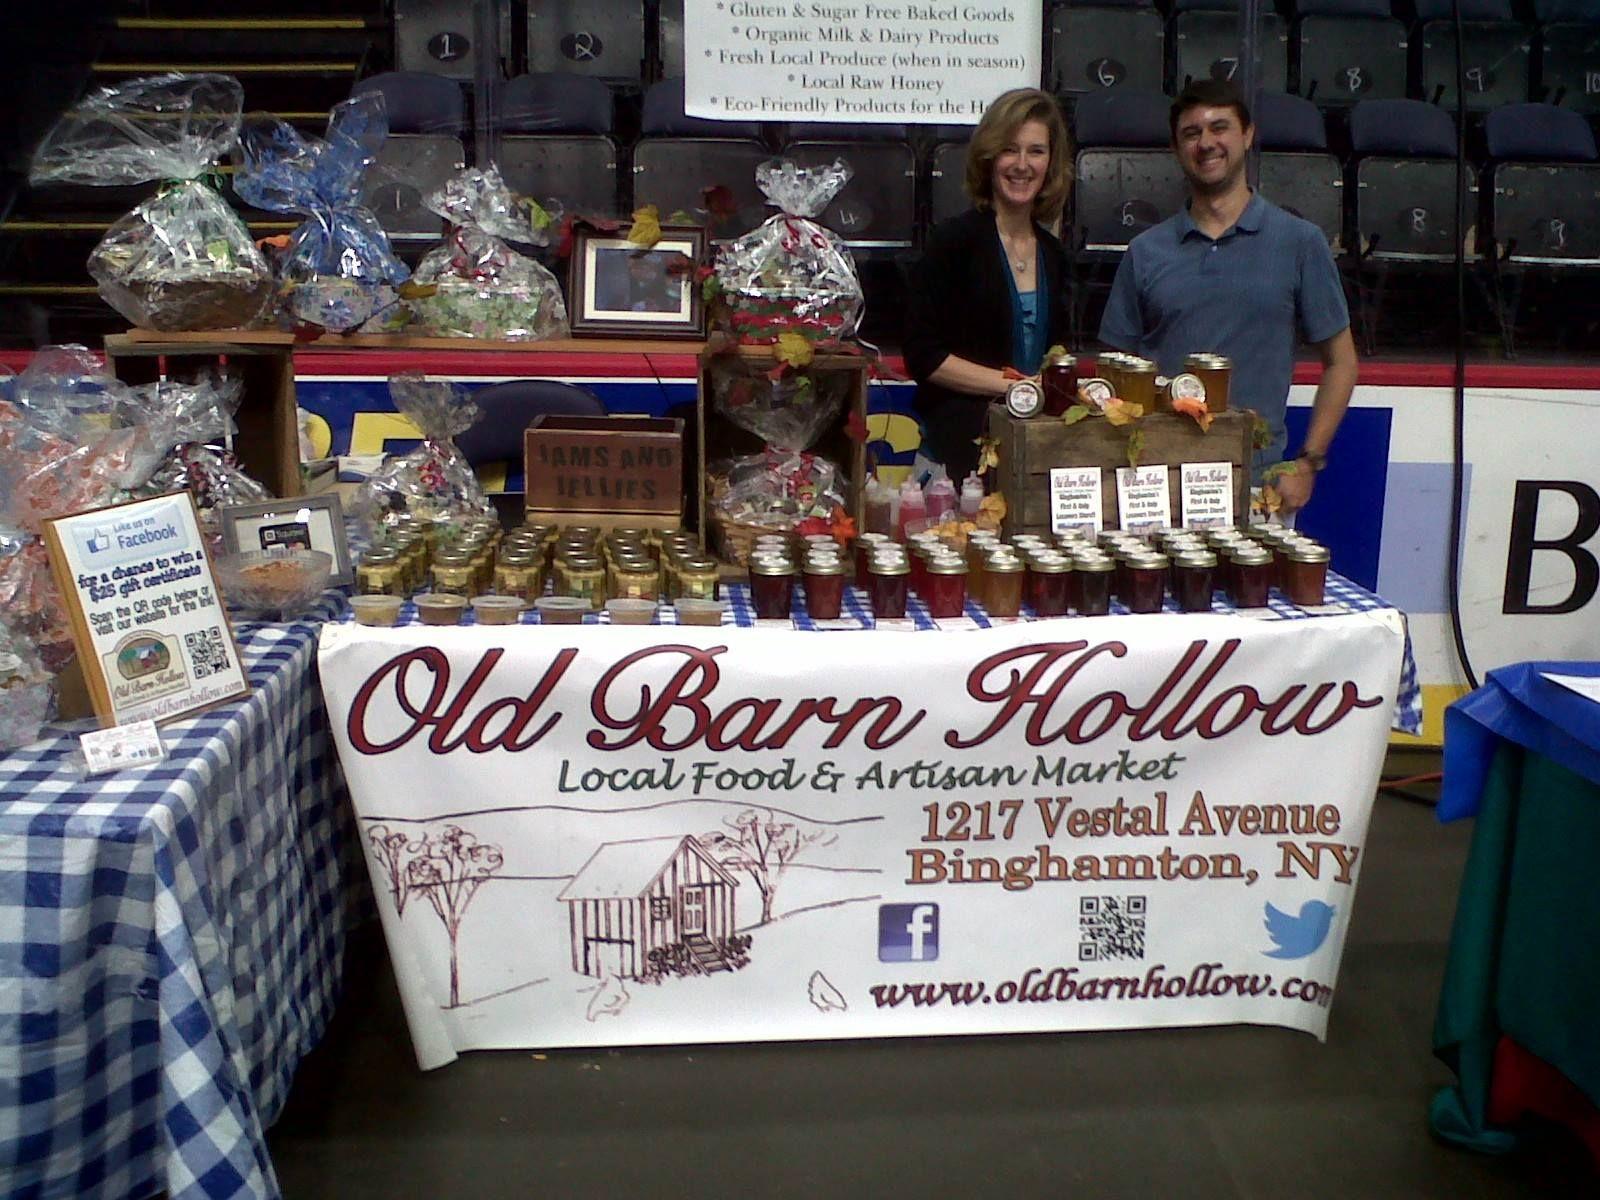 Vendor: Old Barn Hollow